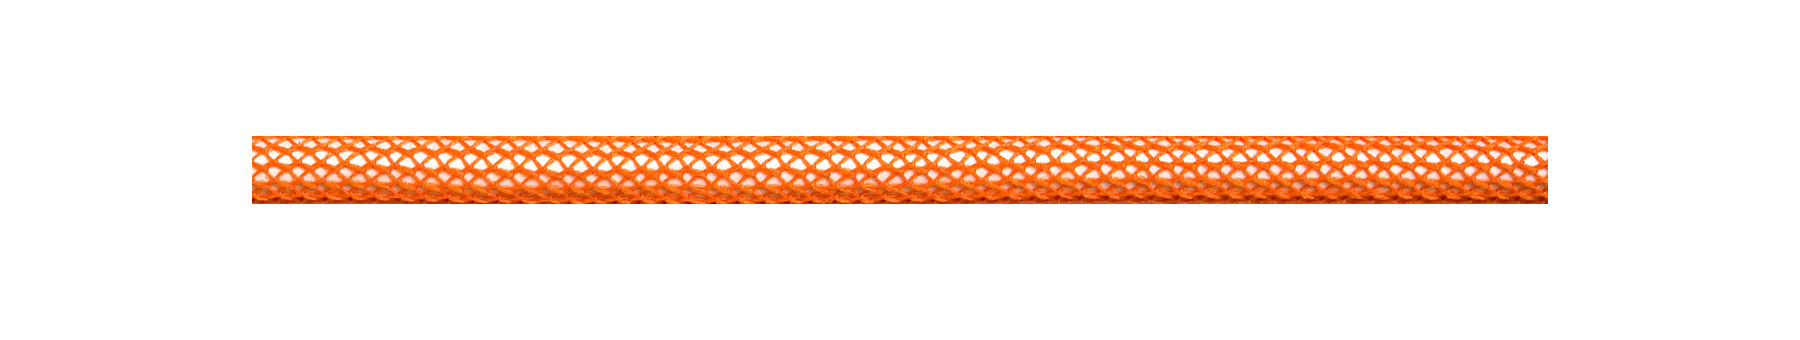 Textile Cable Orange Netlike Textile Covering